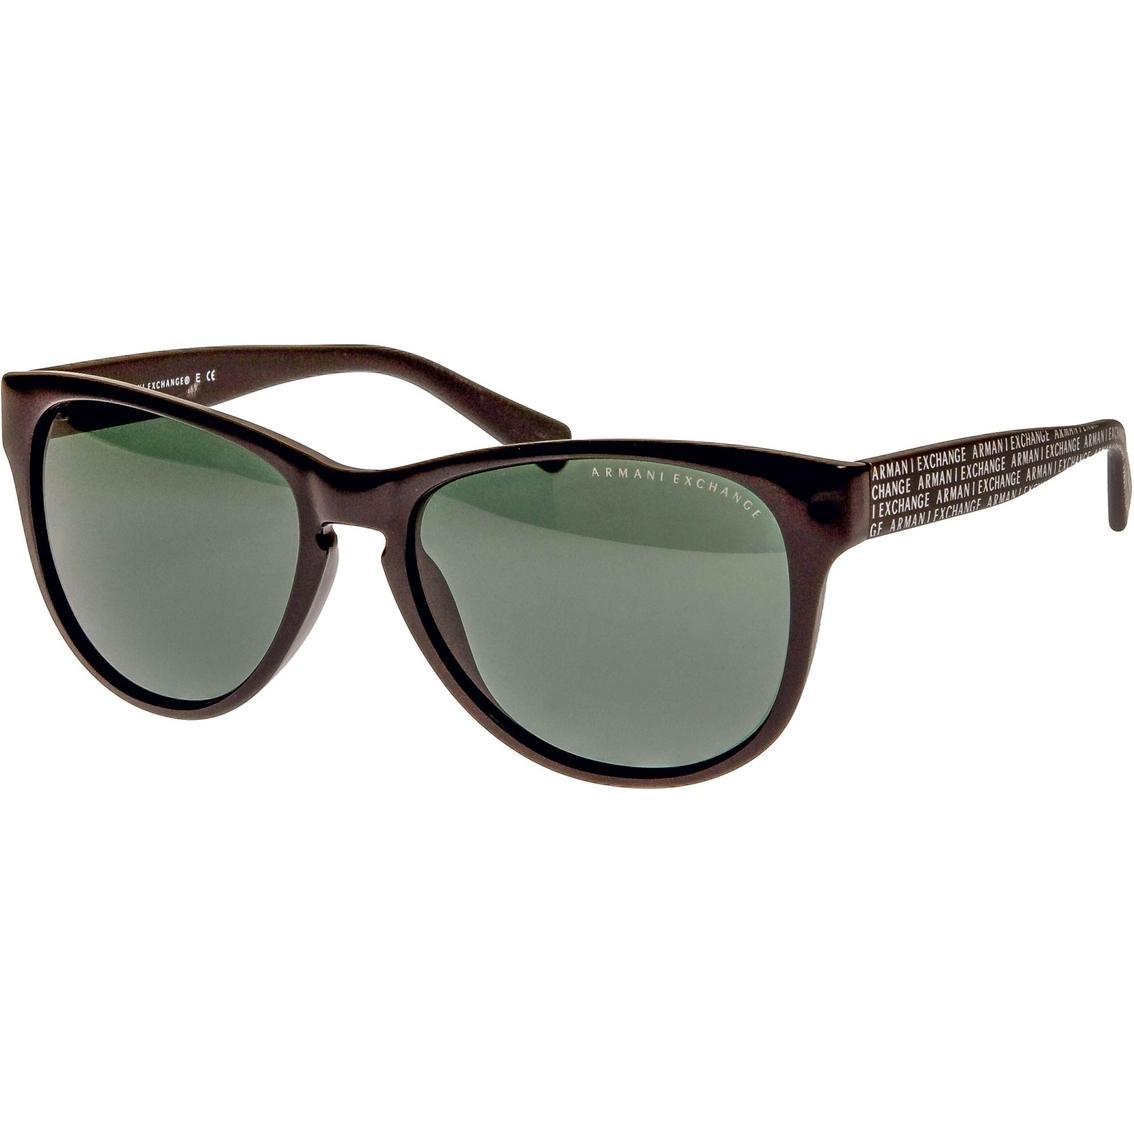 8f021368 Armani Exchange Urban Attitude Multi Text Sunglasses | Unisex ...